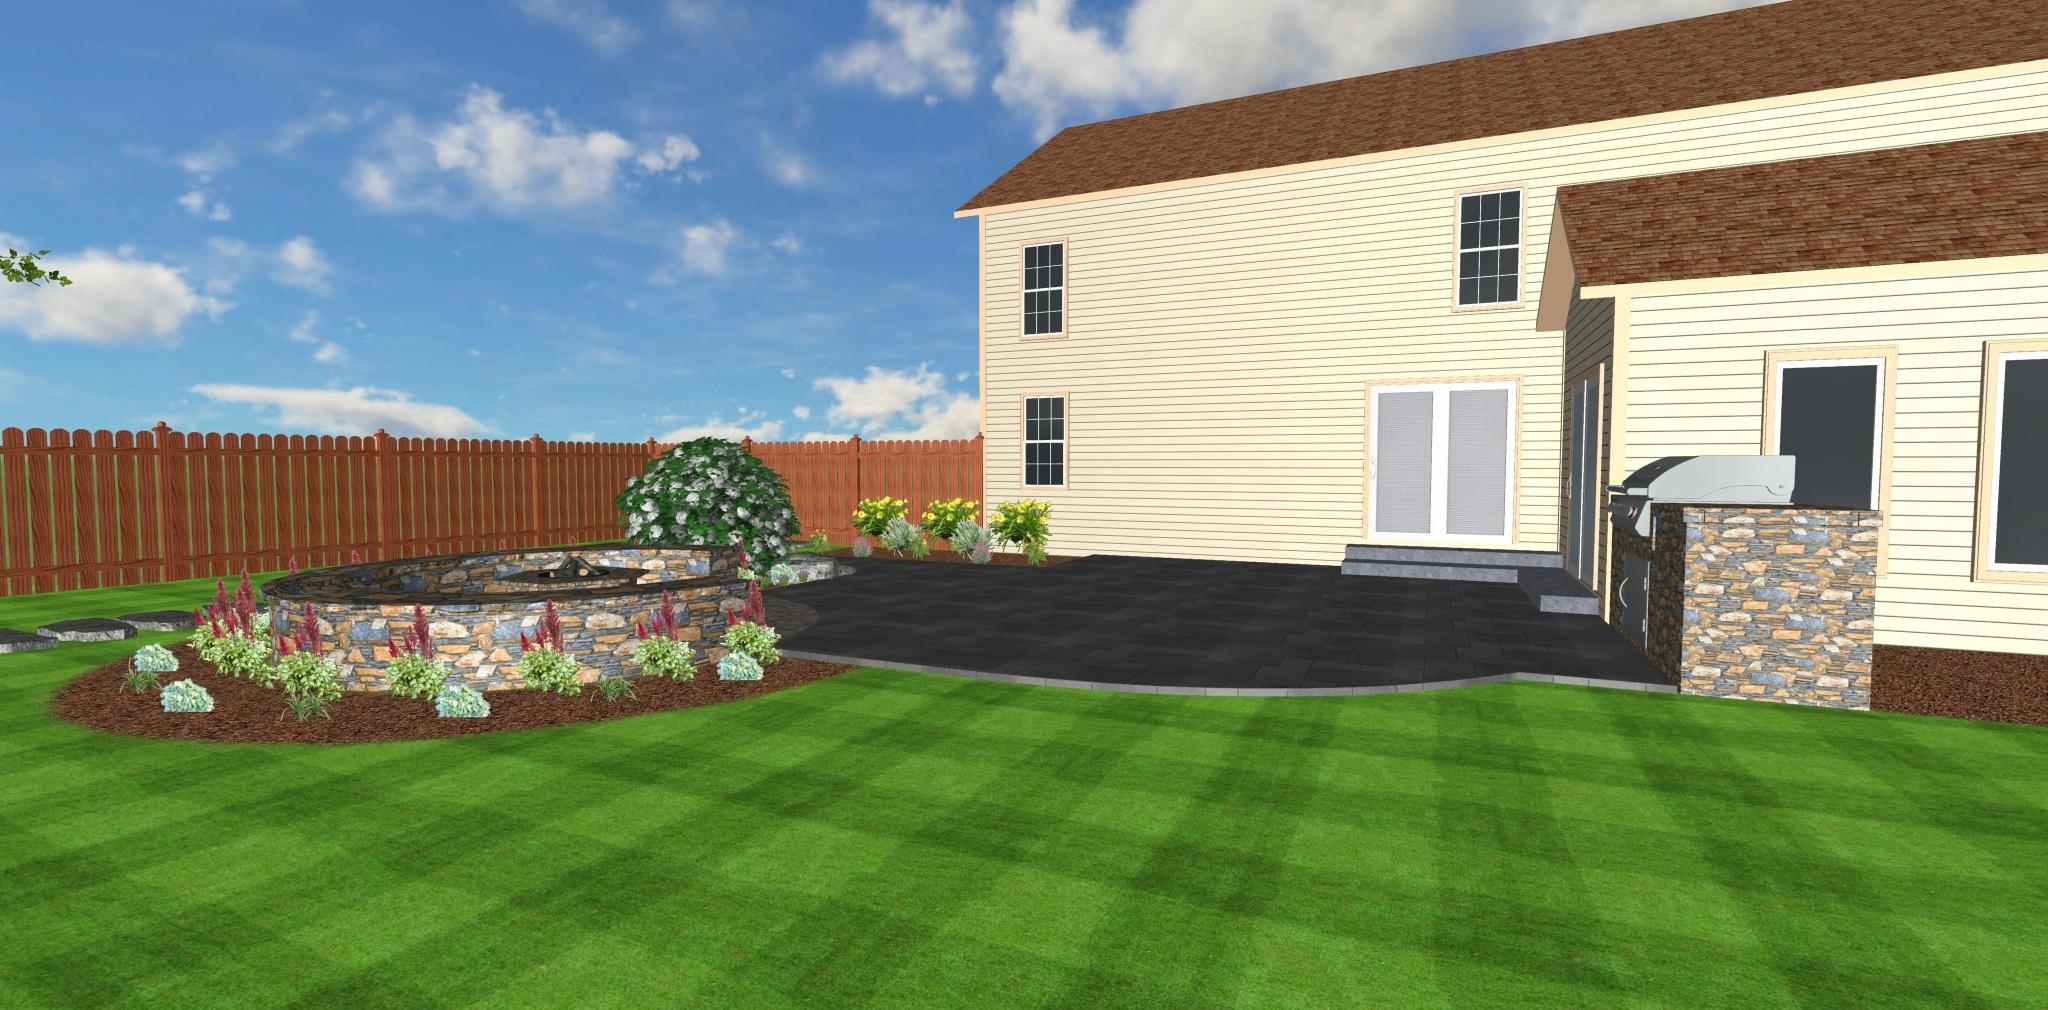 3D landscape design in Colchester, Vermont